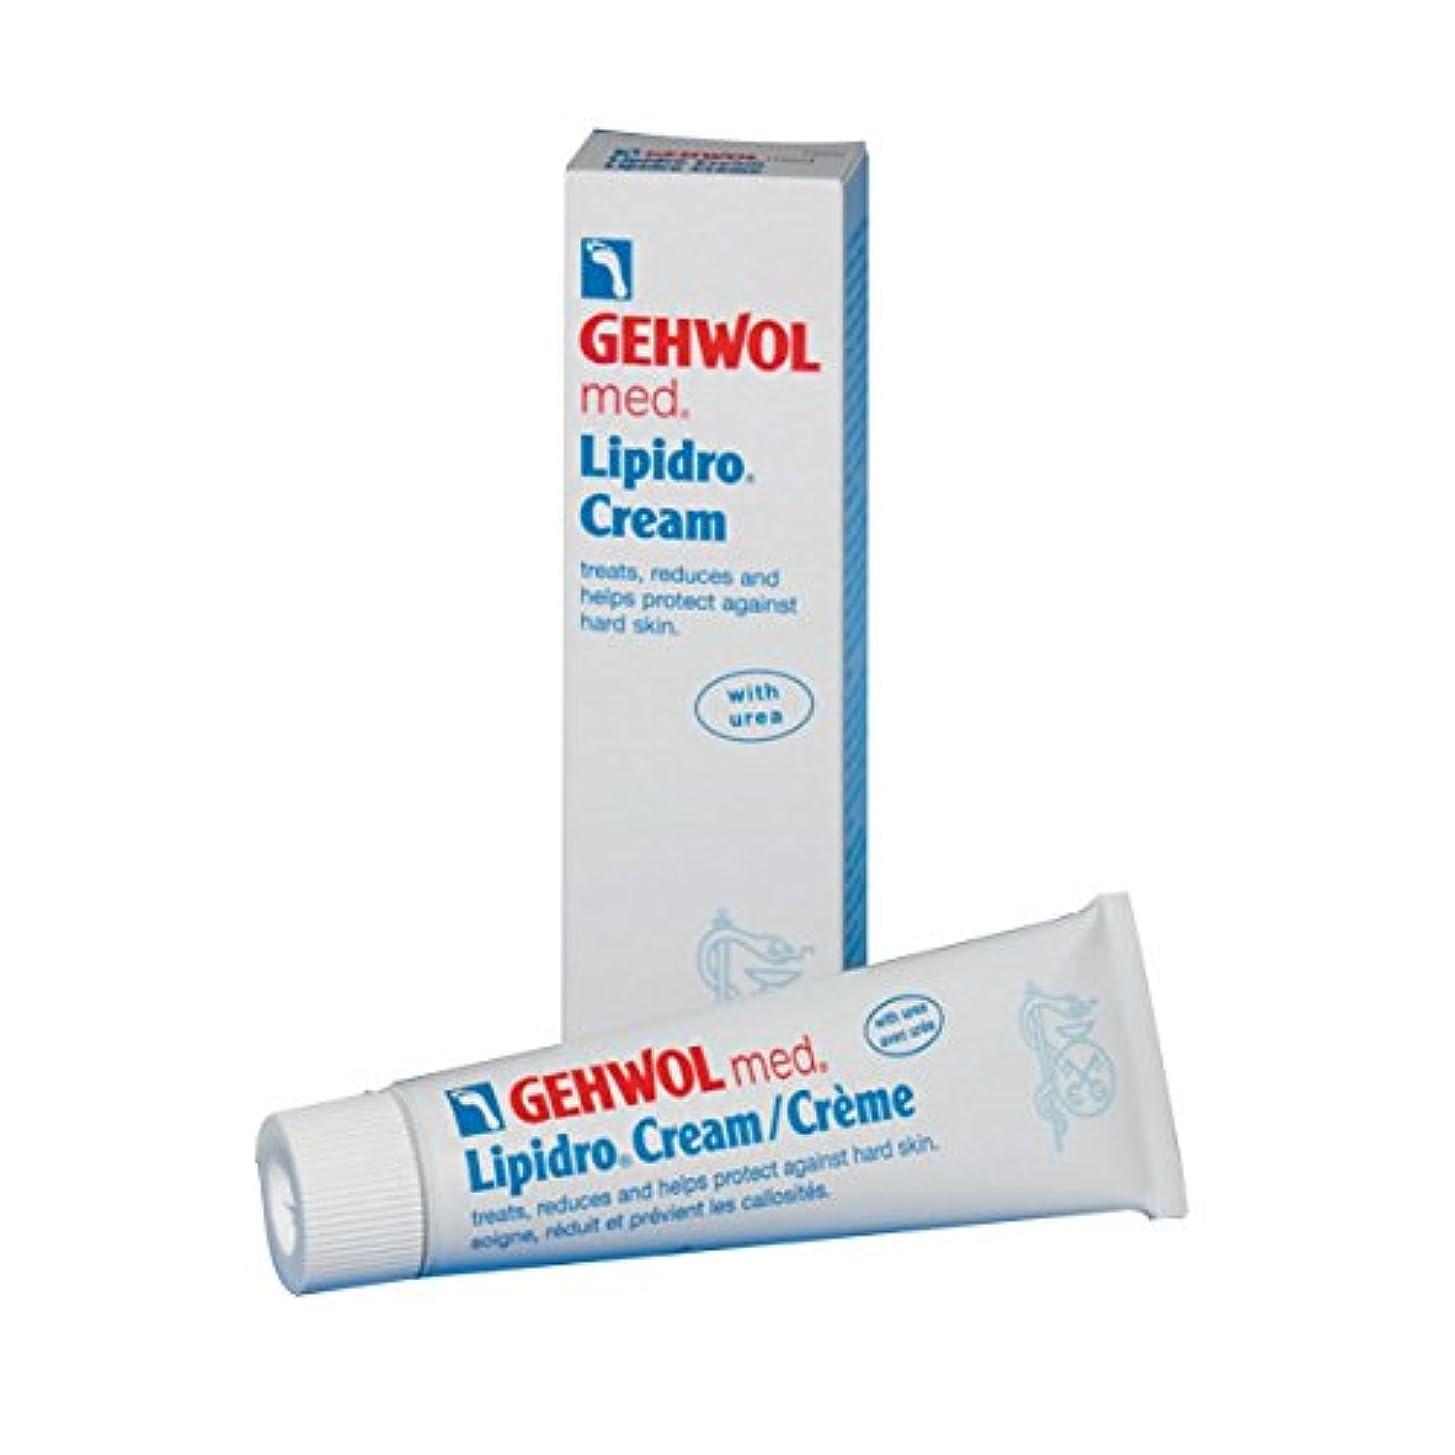 Gehwol Med Lipidro Cream 75ml [並行輸入品]